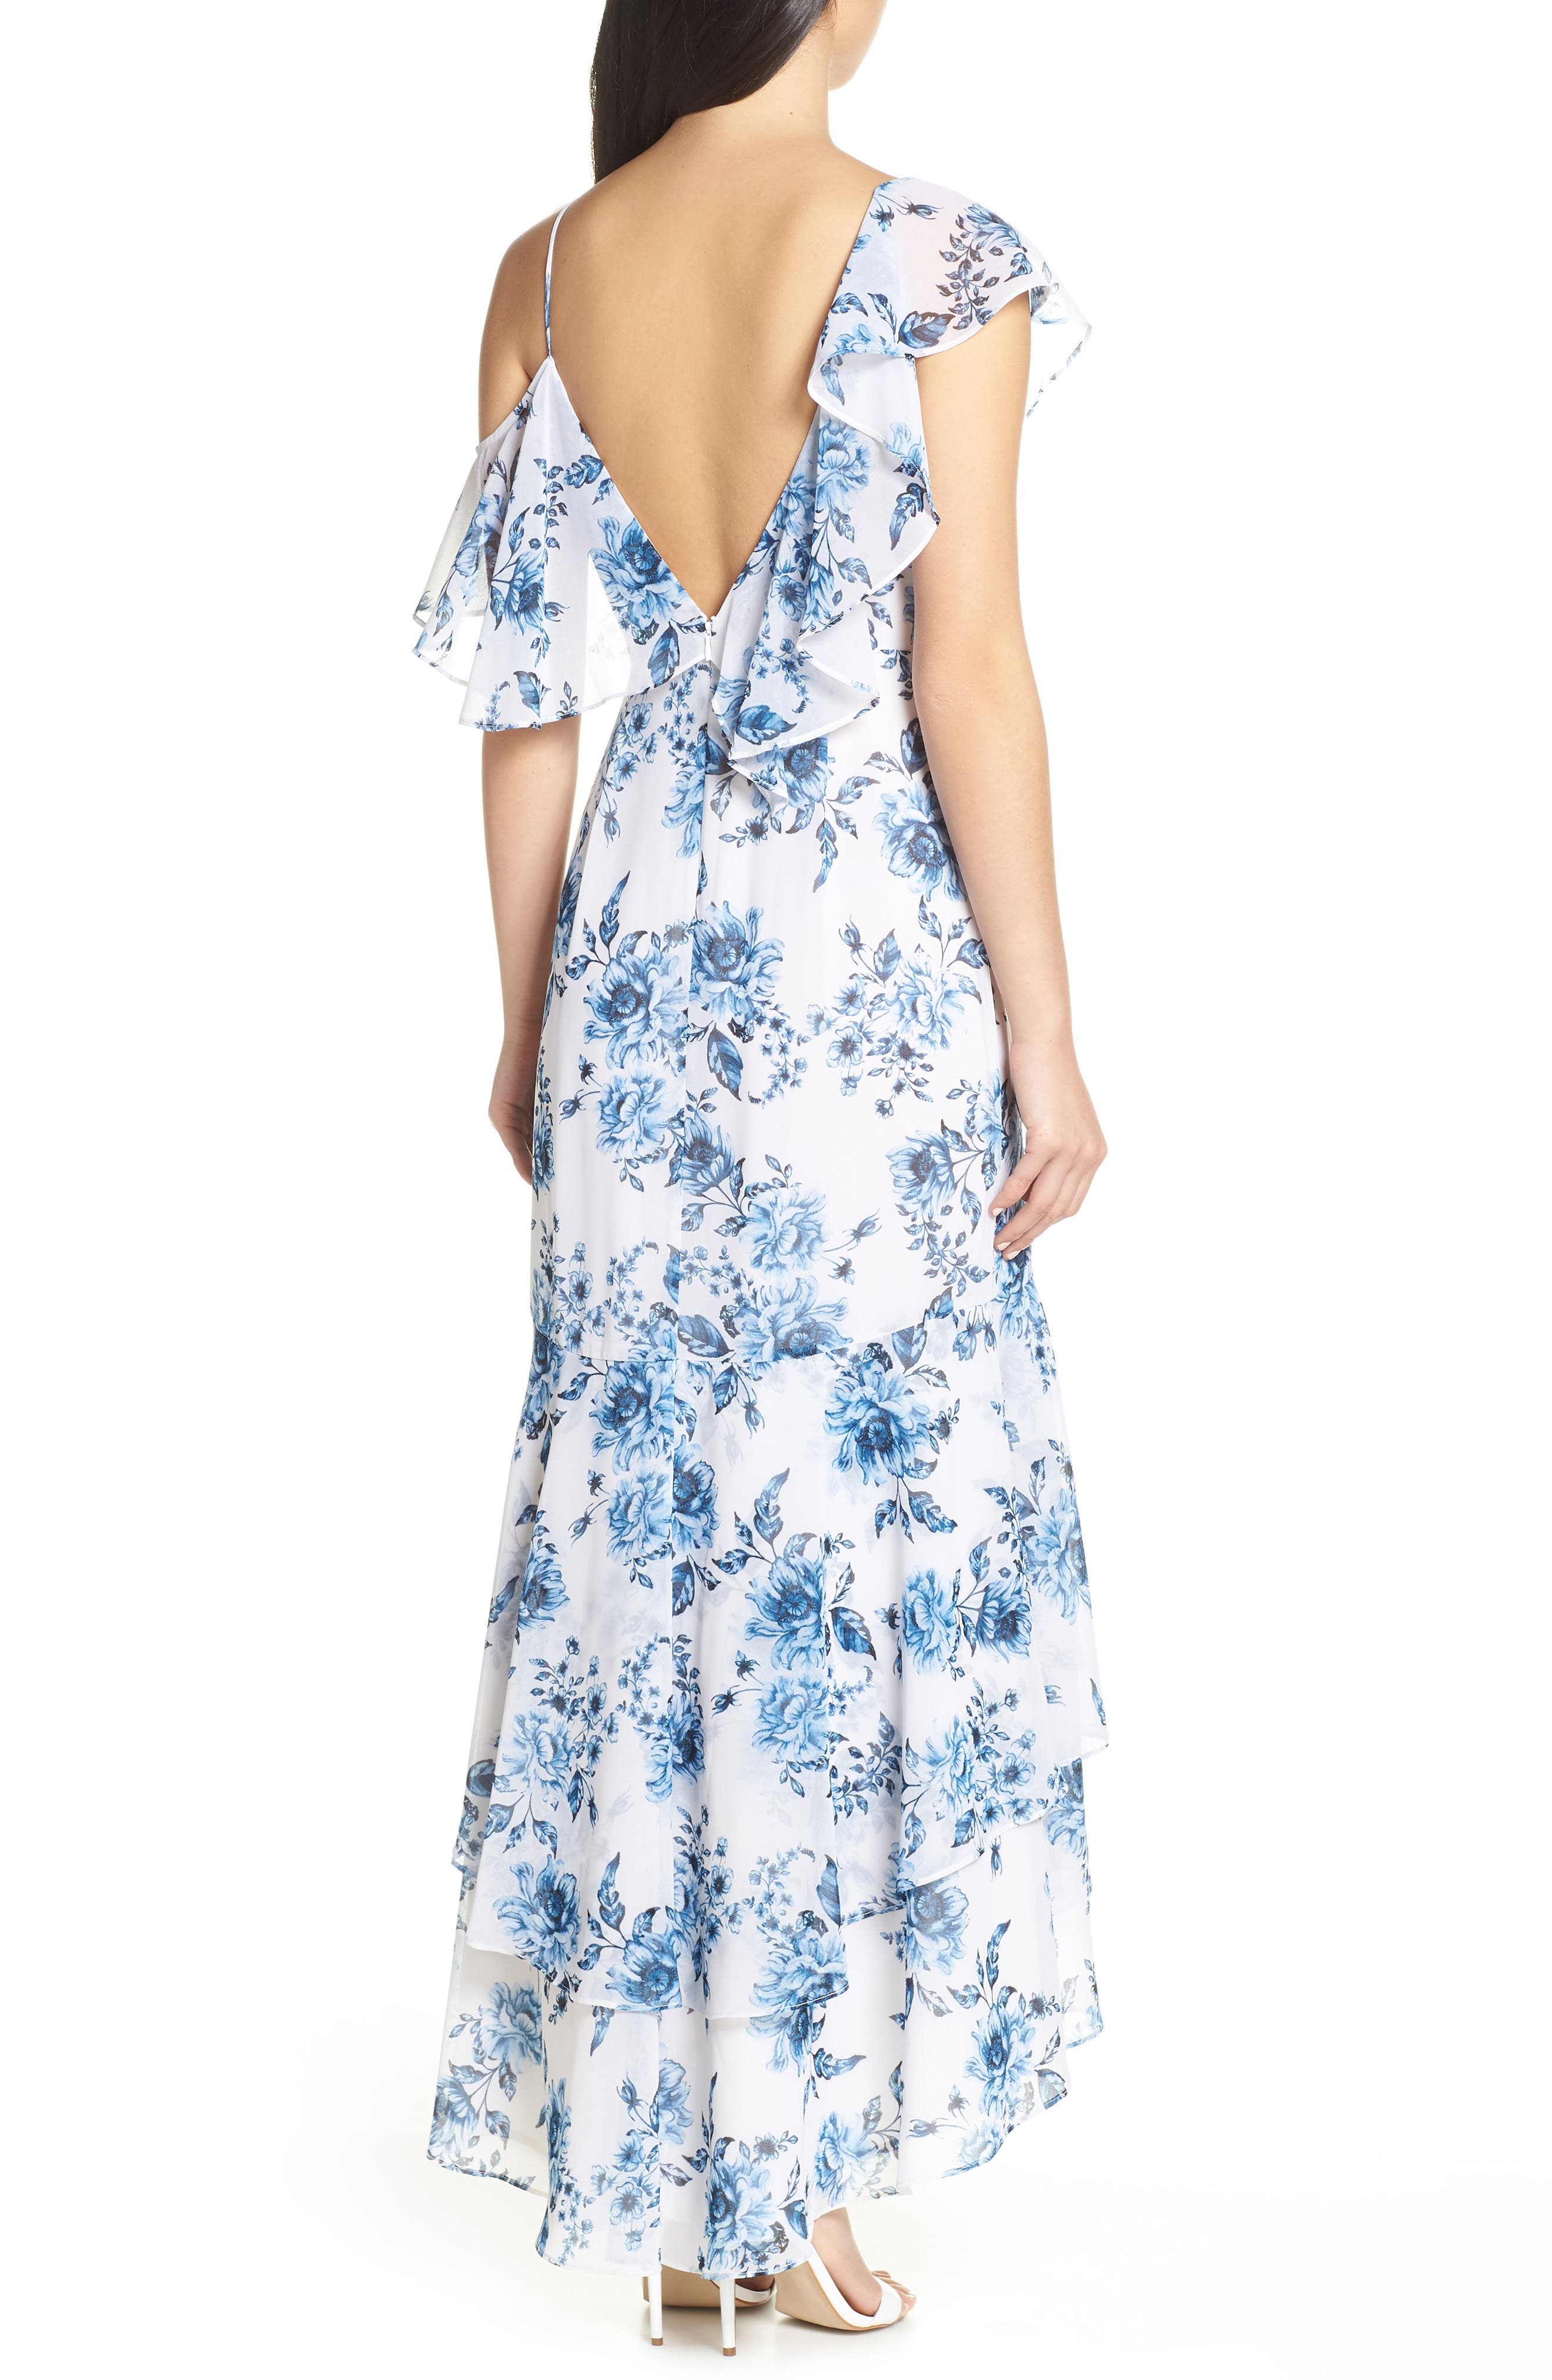 Elanor Ruffle Faux Wrap Maxi Dress,                             Alternate thumbnail 2, color,                             BLUE TOILE FLORAL